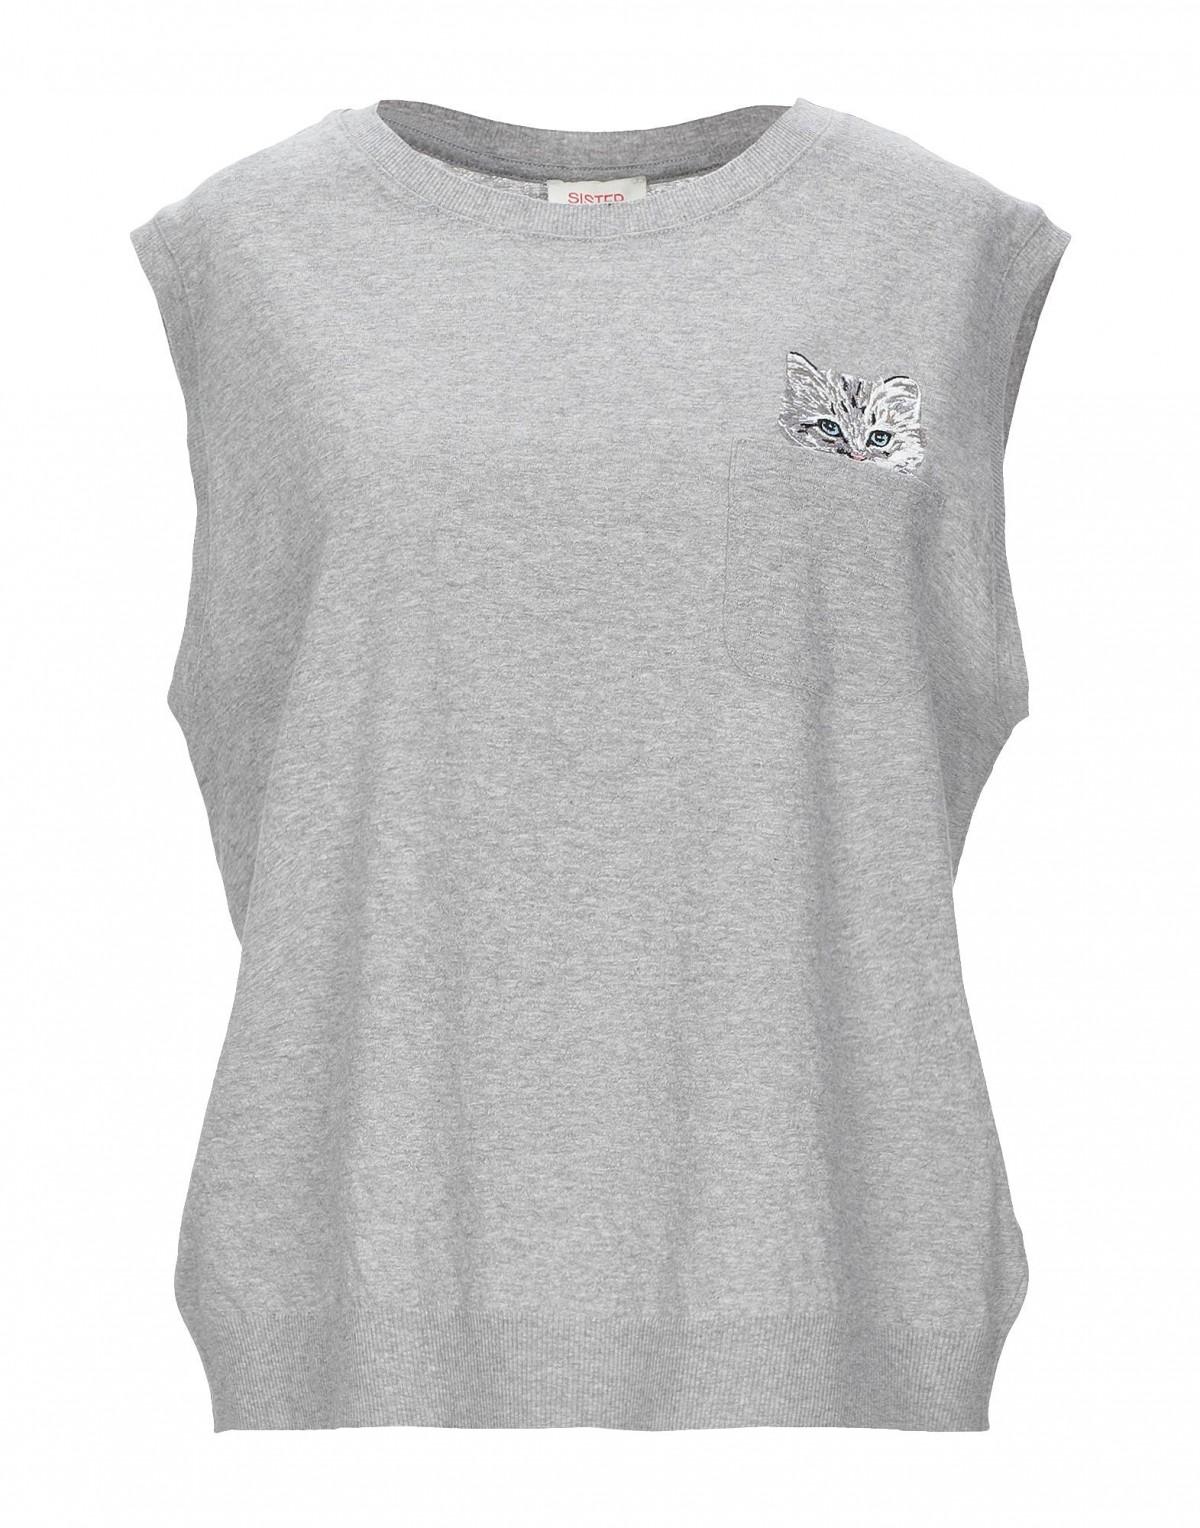 Women's T-shirt with a Cat